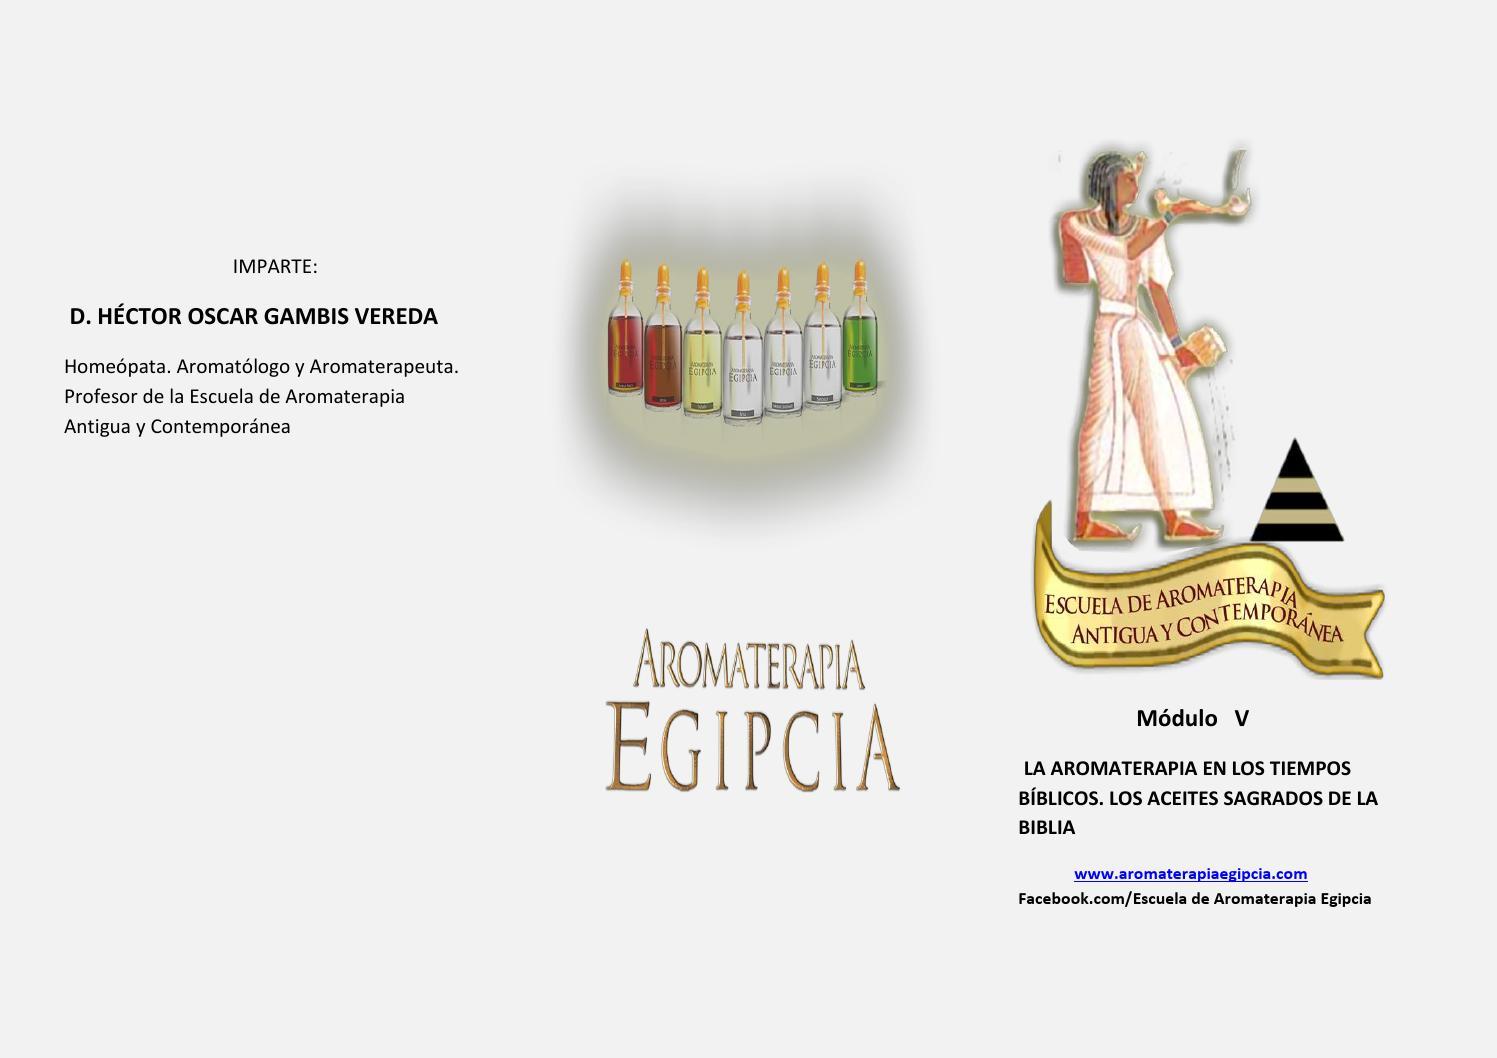 triptico manual v aceites biblicos by aromaterapia egipcia